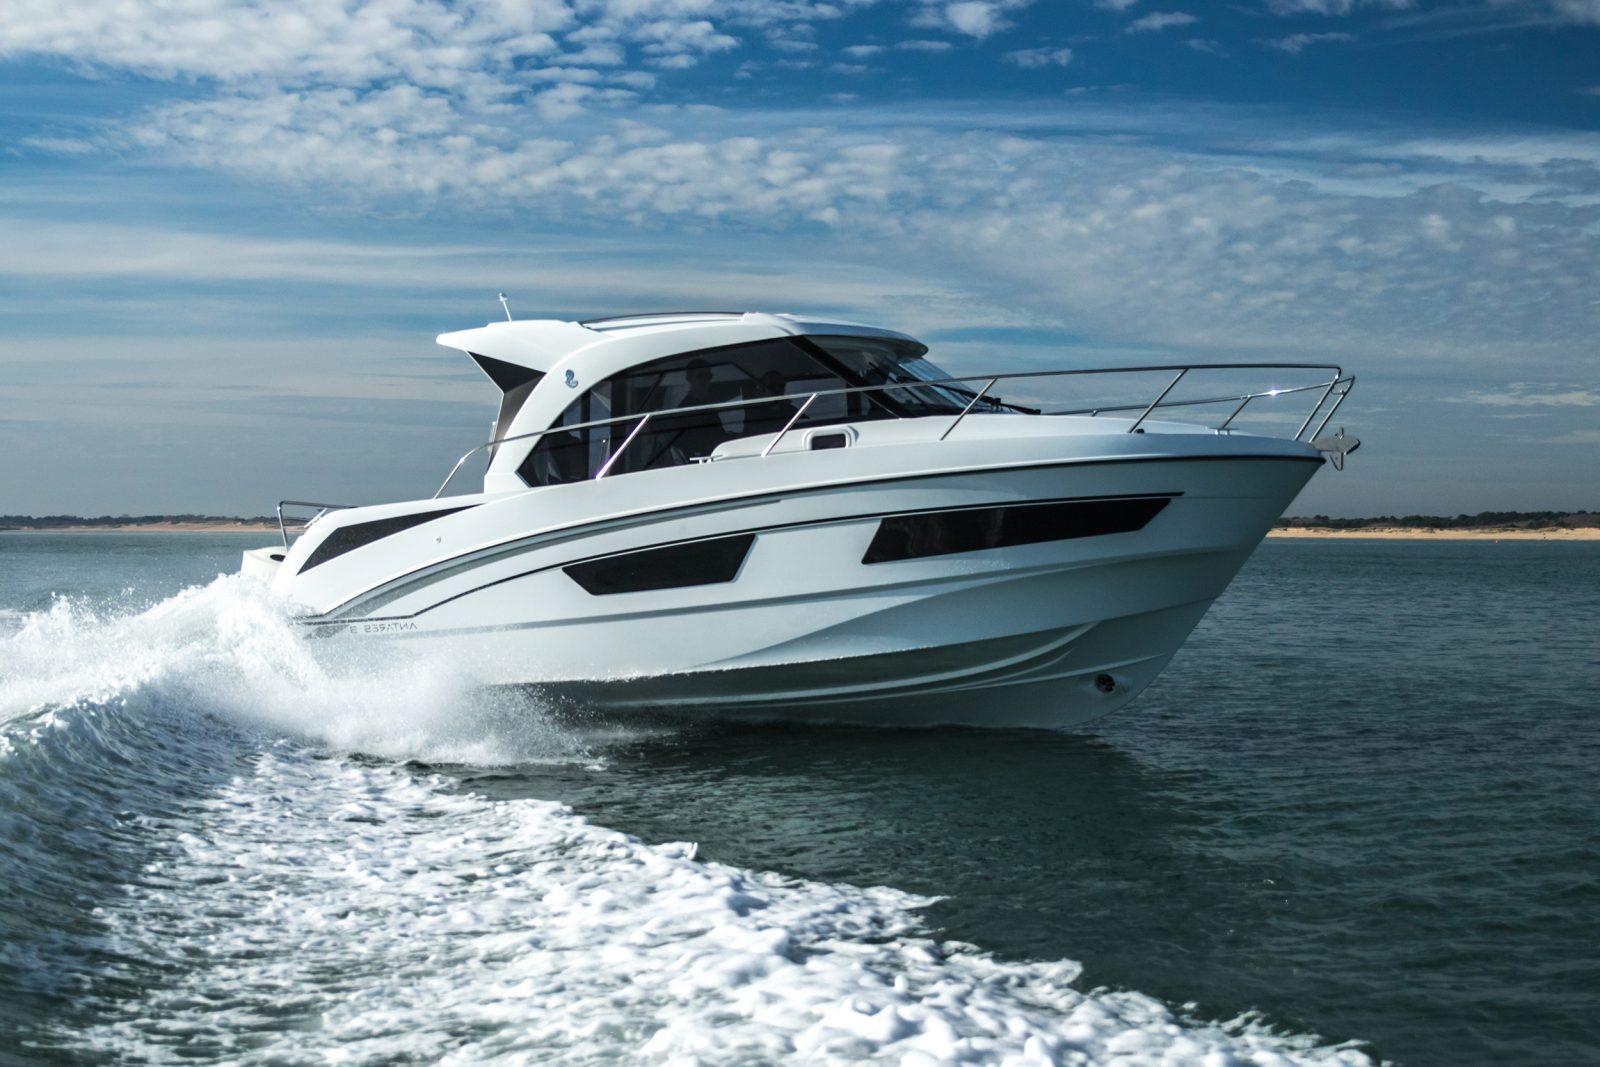 Simpson Marine - Antares Outboard 9